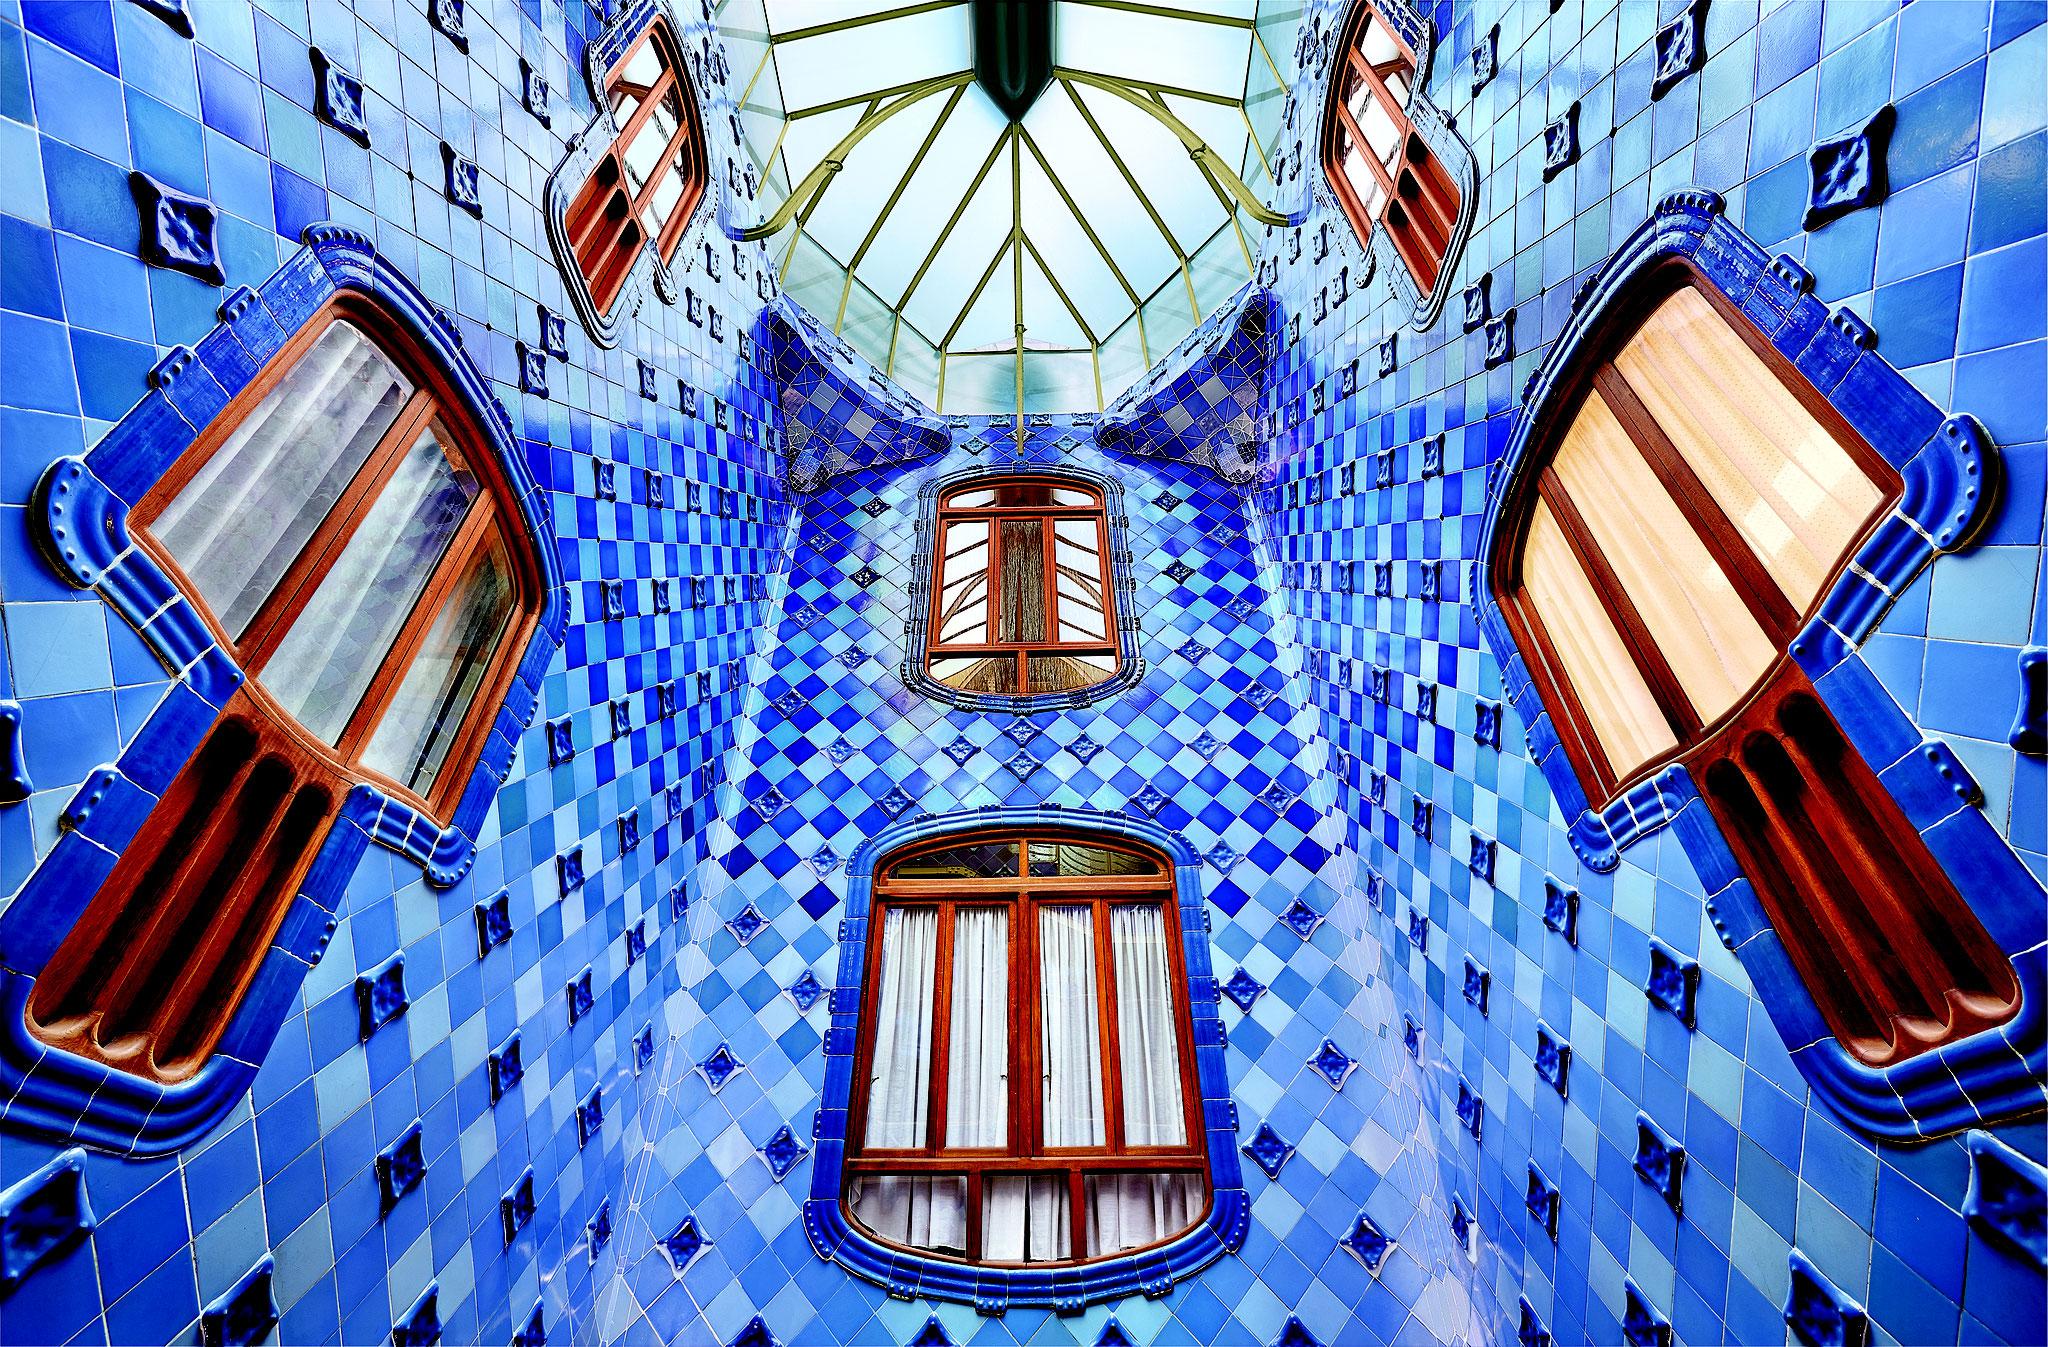 © Casa Batlló – Gaudí – Barcelona (www.casabatllo.es)